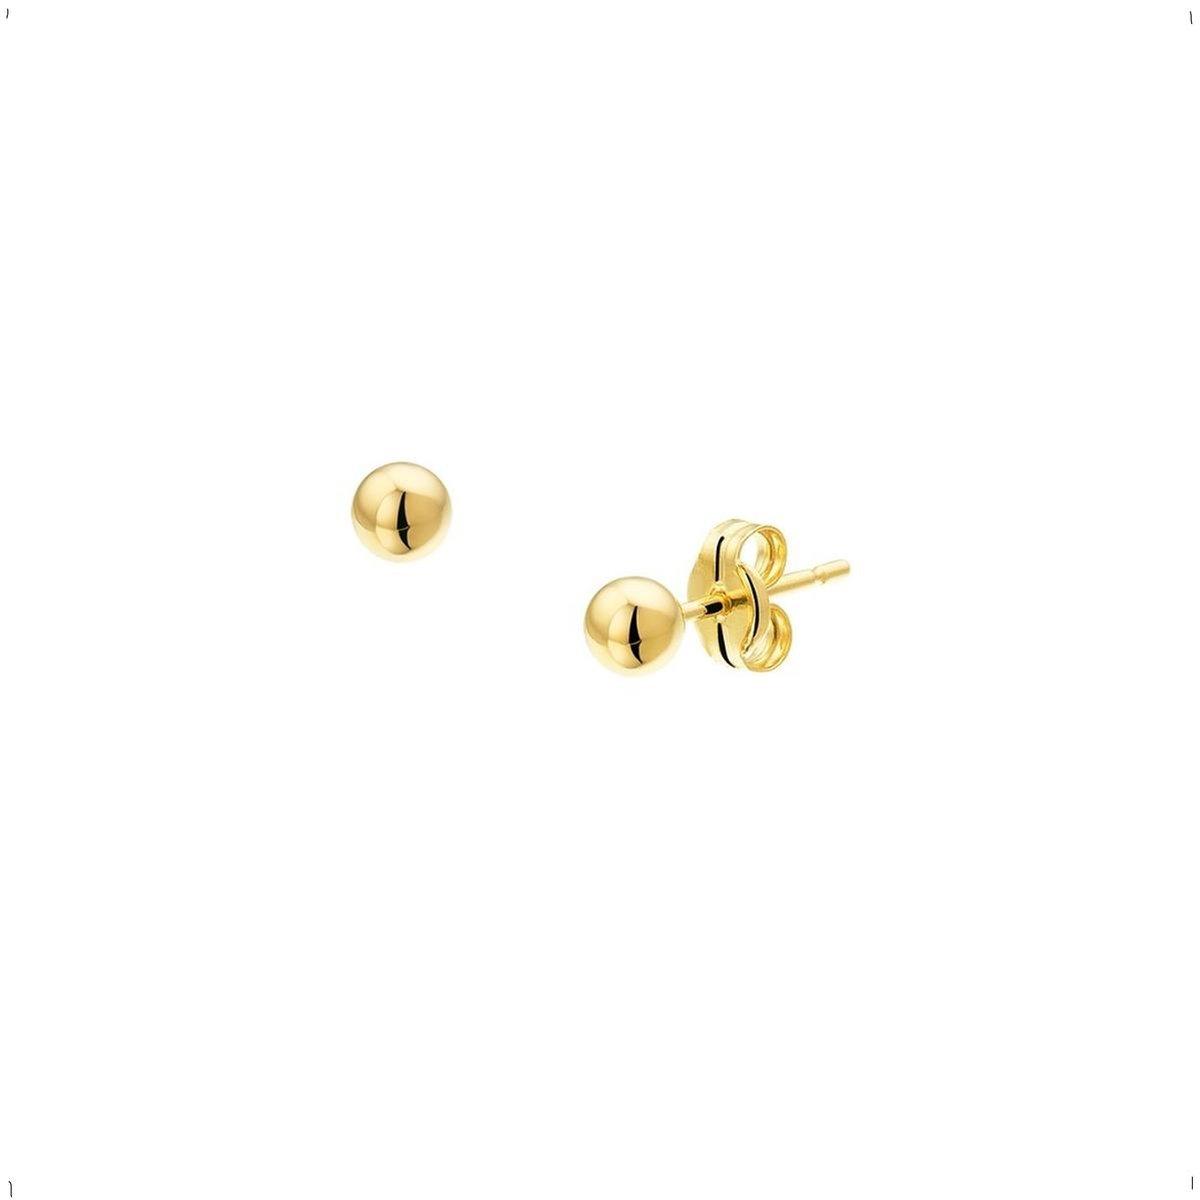 Oorbellen Dames - Goud - Oorknoppen - Bol - 5mm - Sieraden Vrouw - Heren - Poli - 0.41gr - Massief Goud - 14 Karaat - 585 Goud